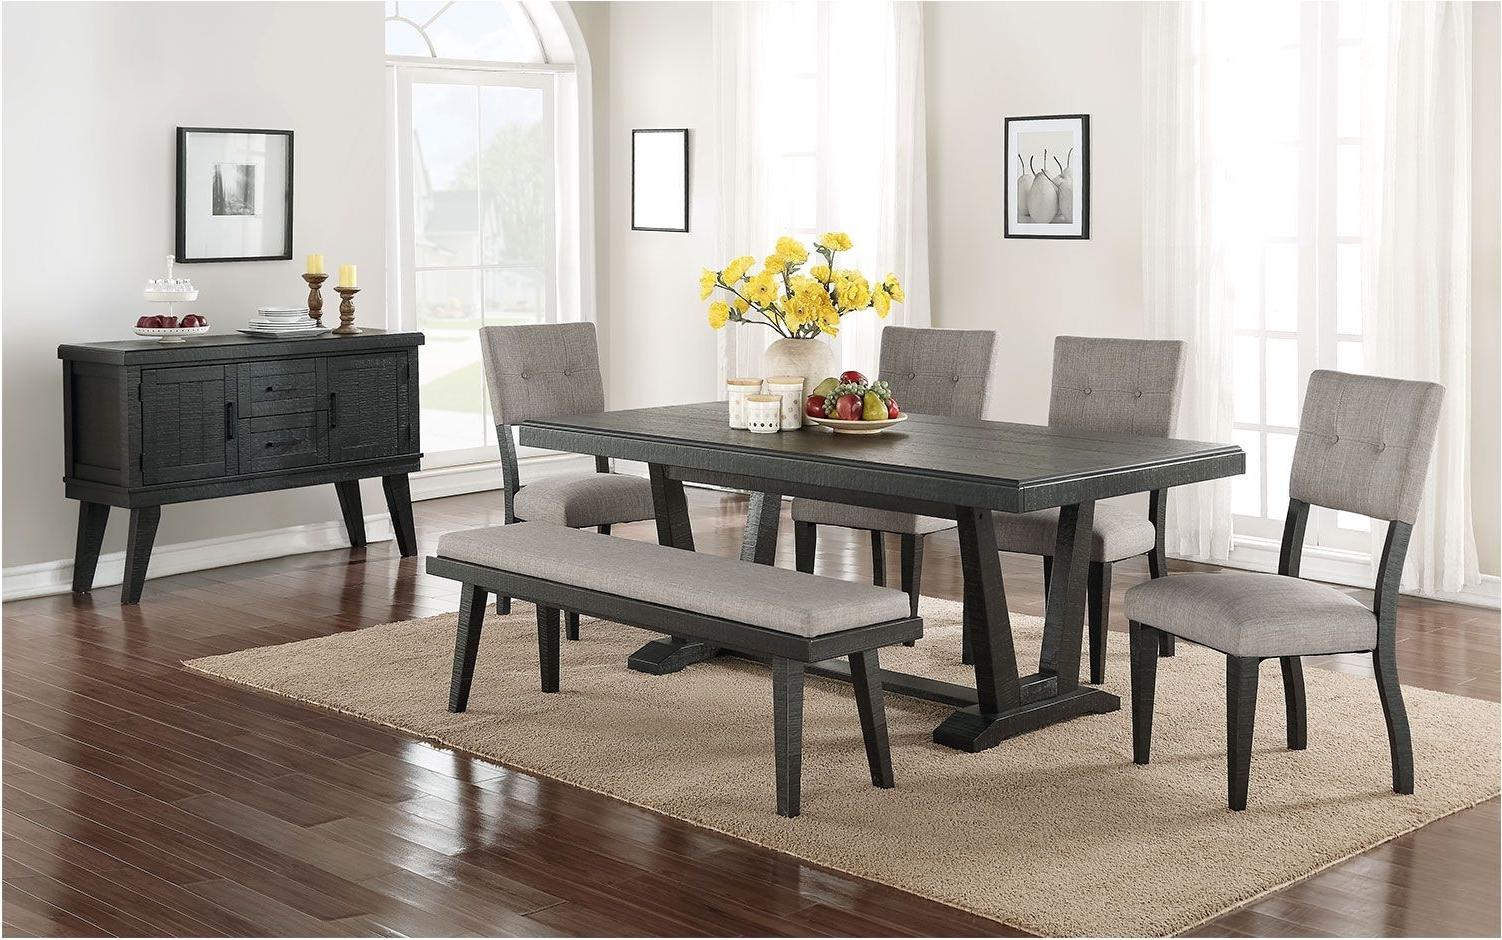 Latest Stunning 6 Piece Dining Room Set Black And Grey Leon – Dining Room With Leon 7 Piece Dining Sets (View 4 of 25)